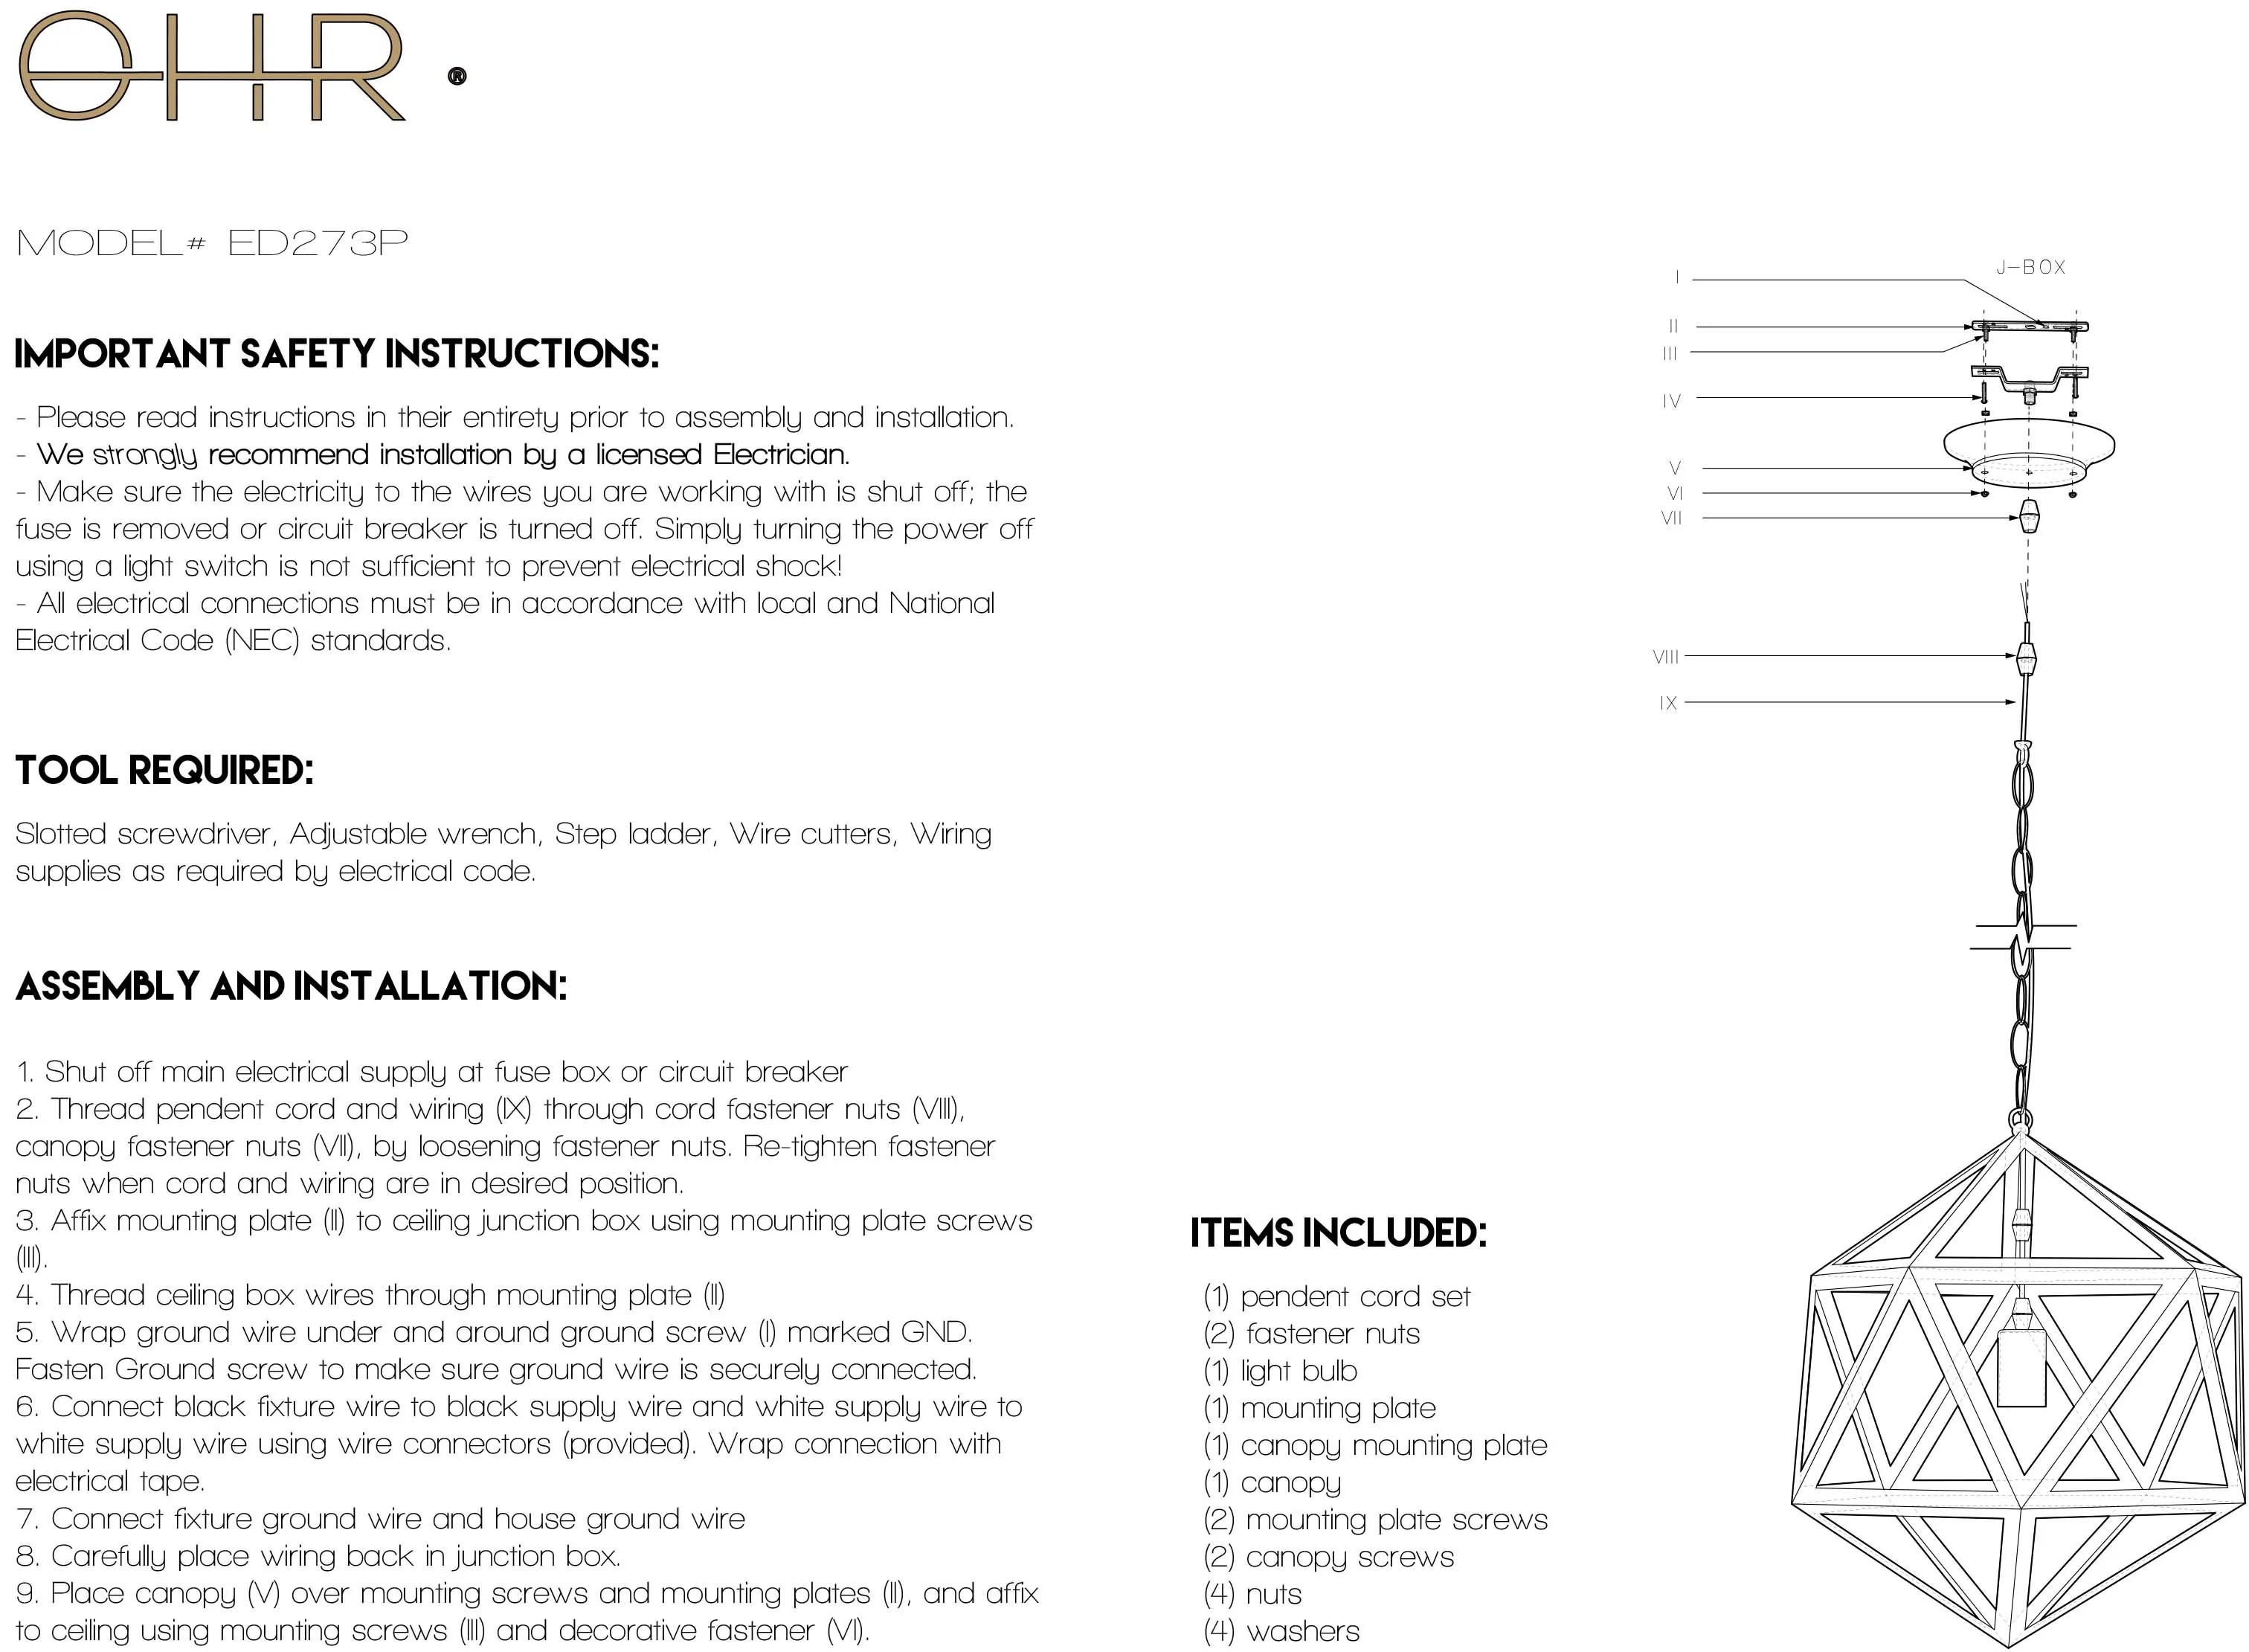 medium resolution of pdf instructions